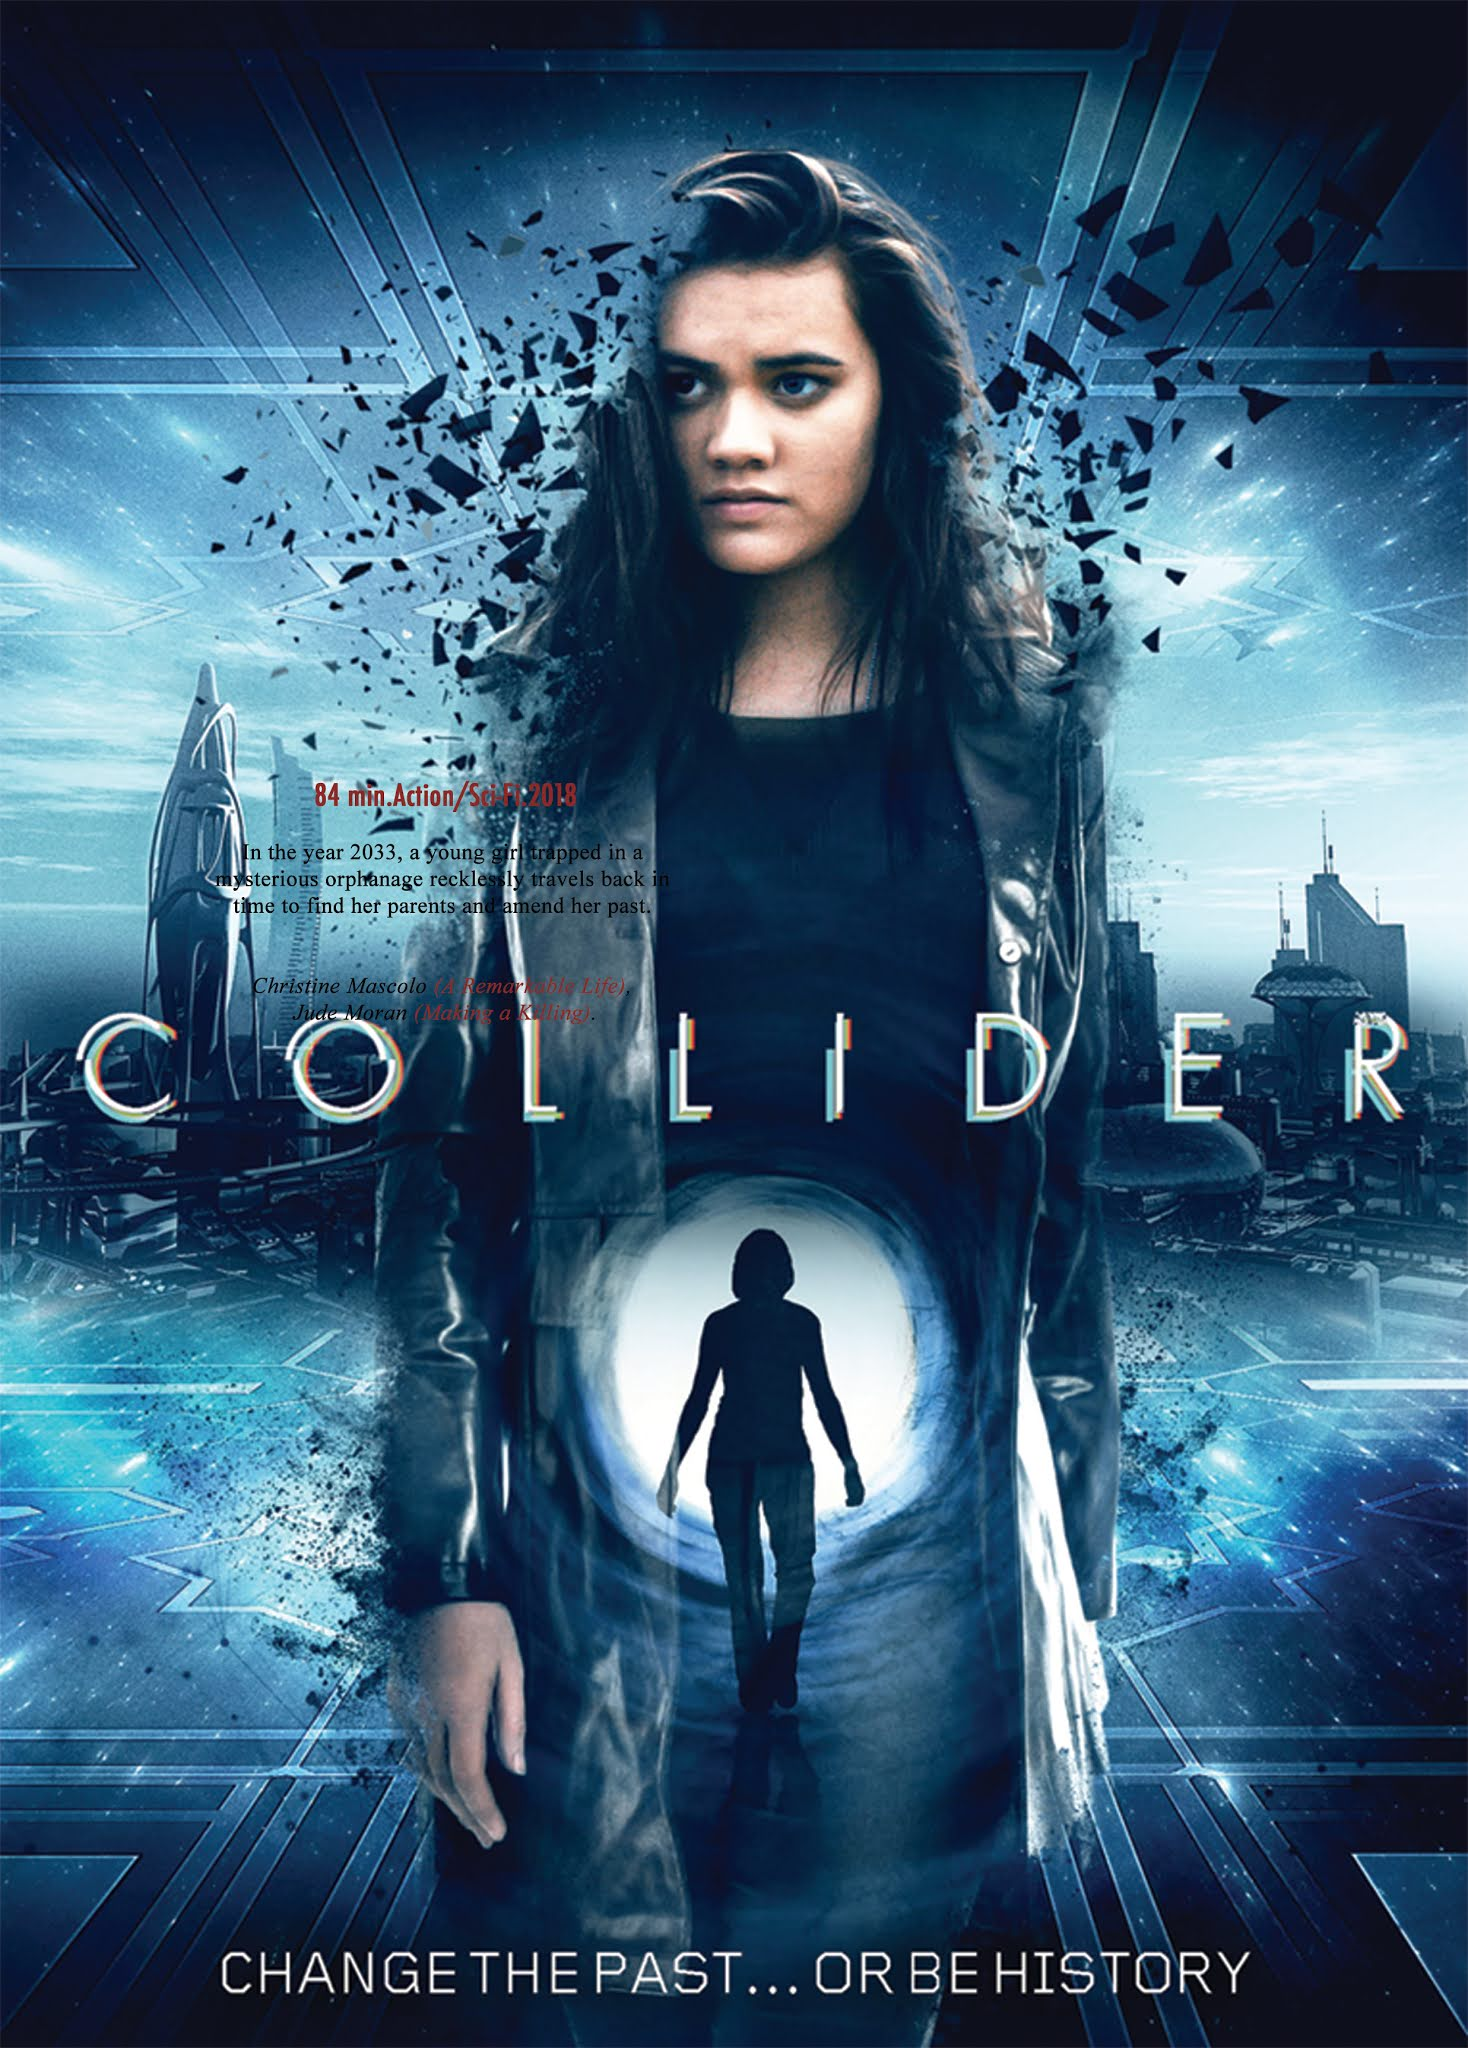 Collider 2018 Hindi Dual Audio Bluray 720p 480p Flixmaza